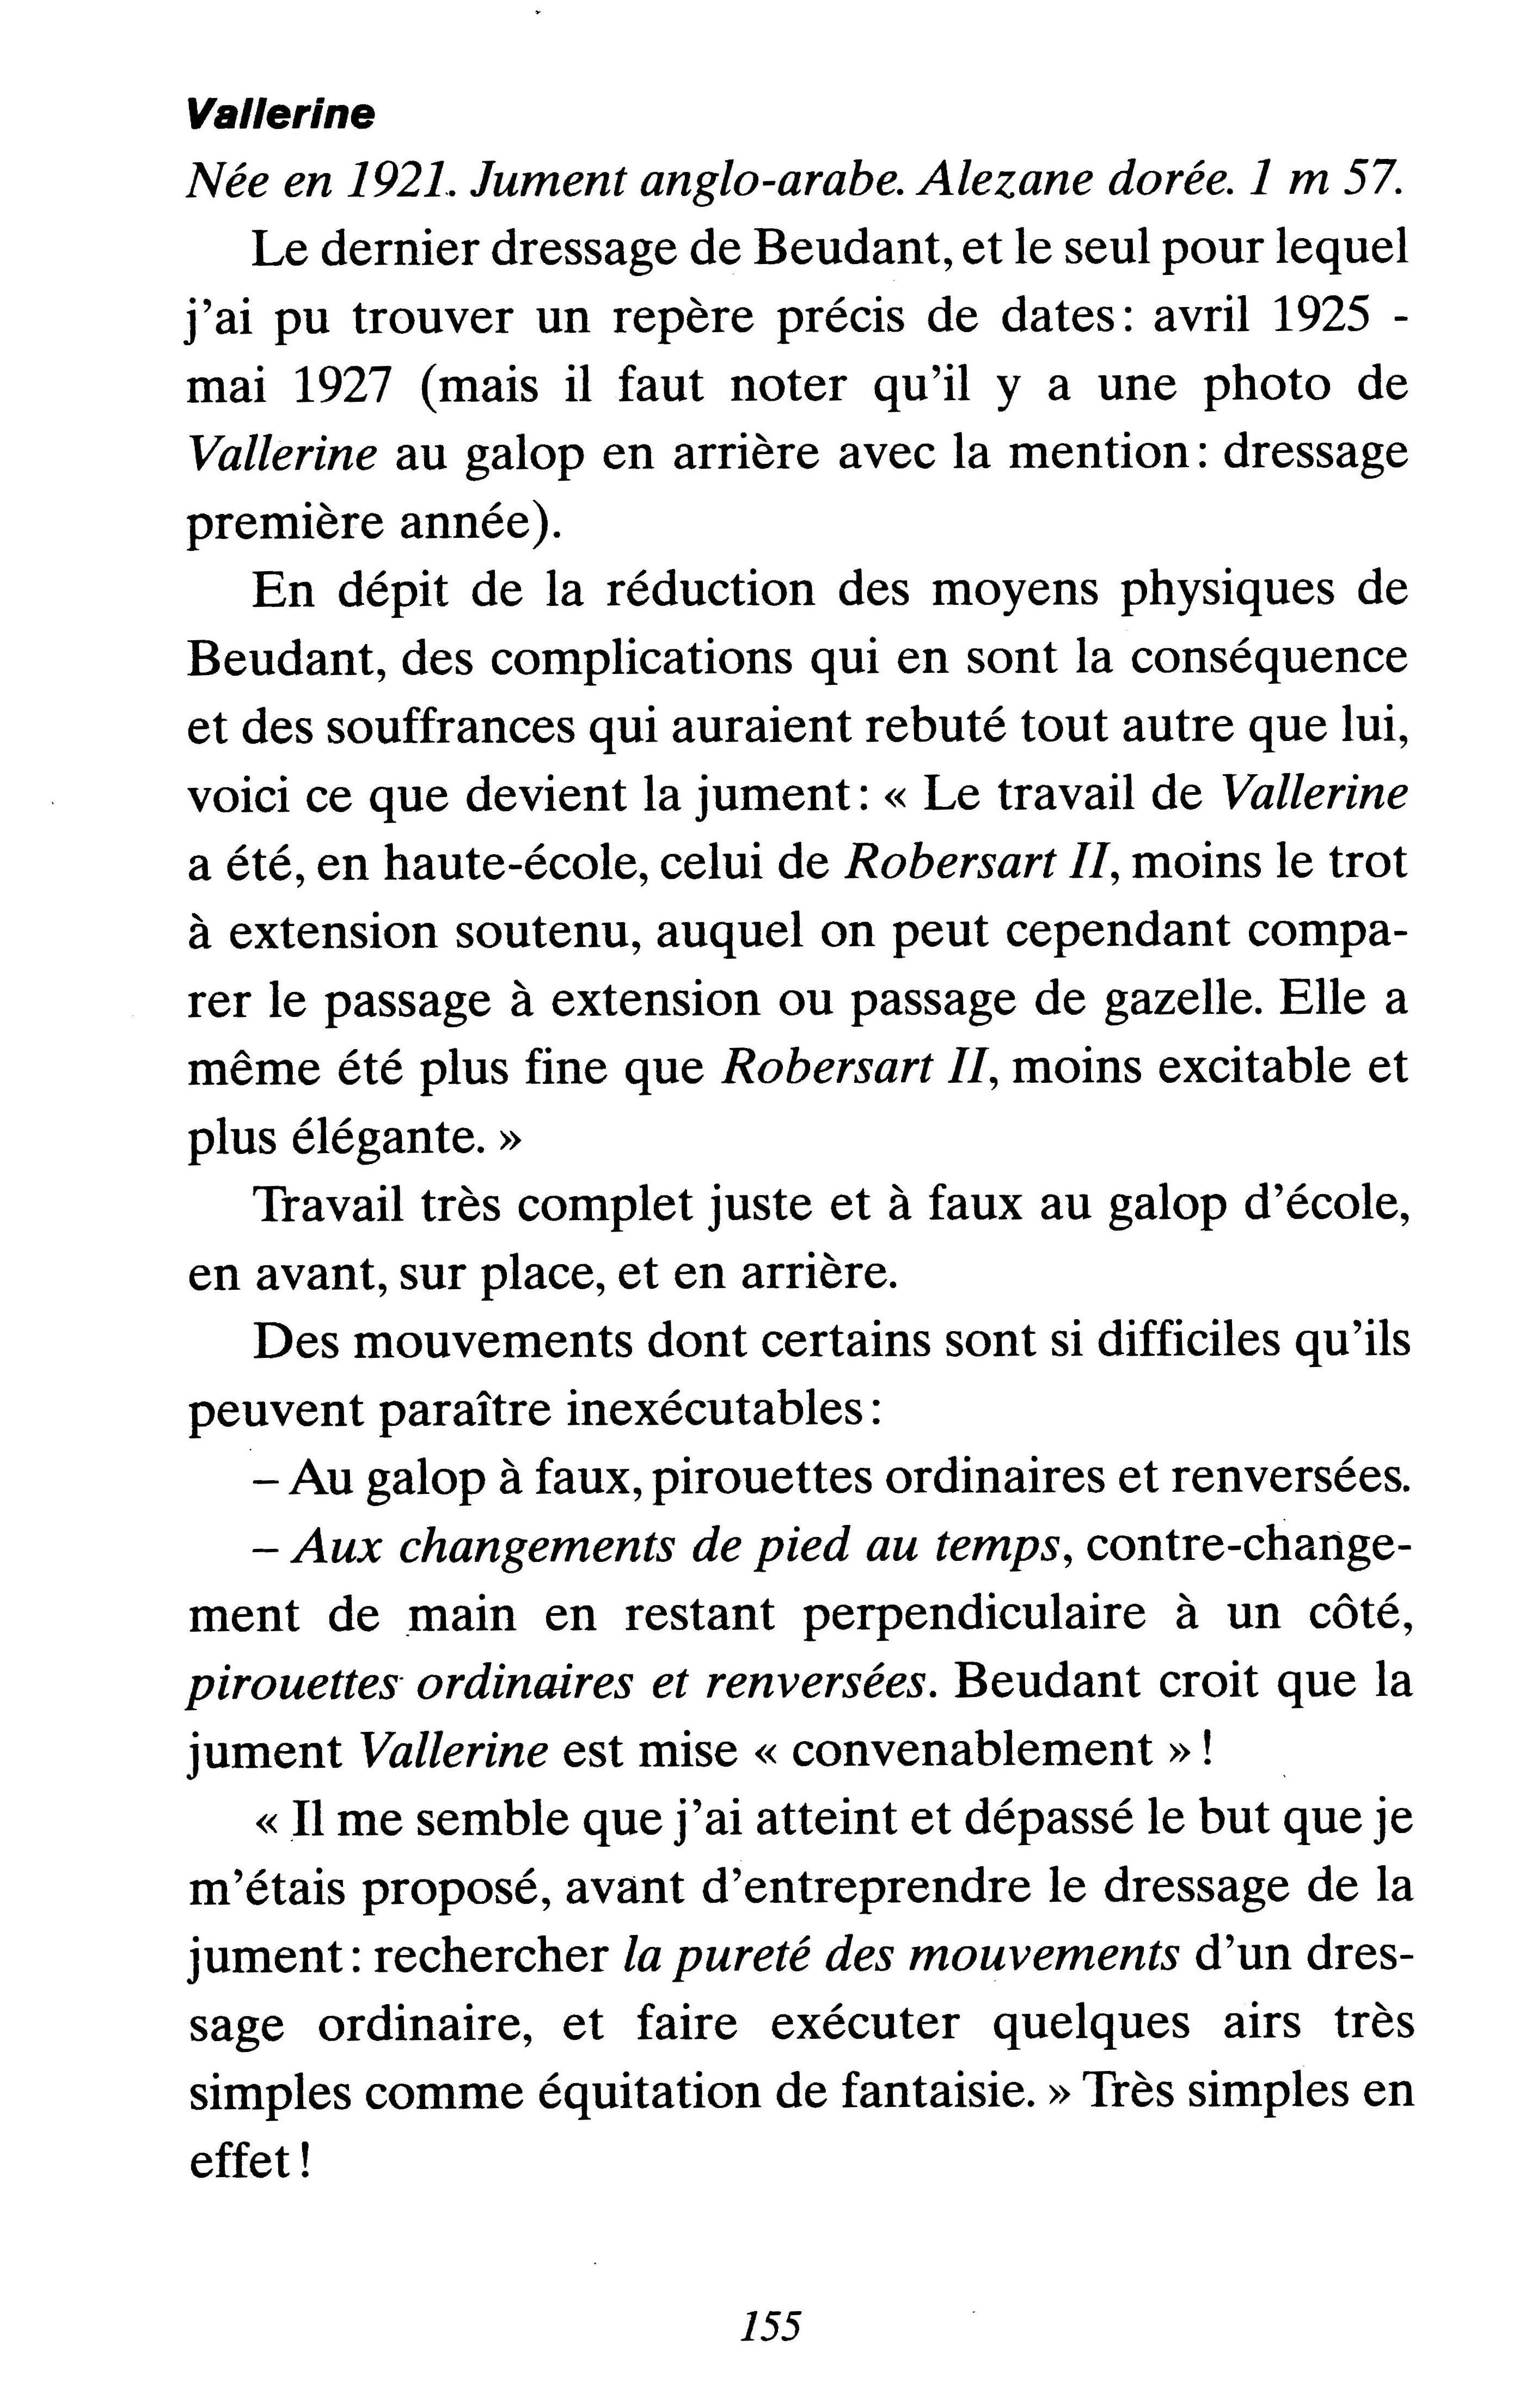 Vallerine texte